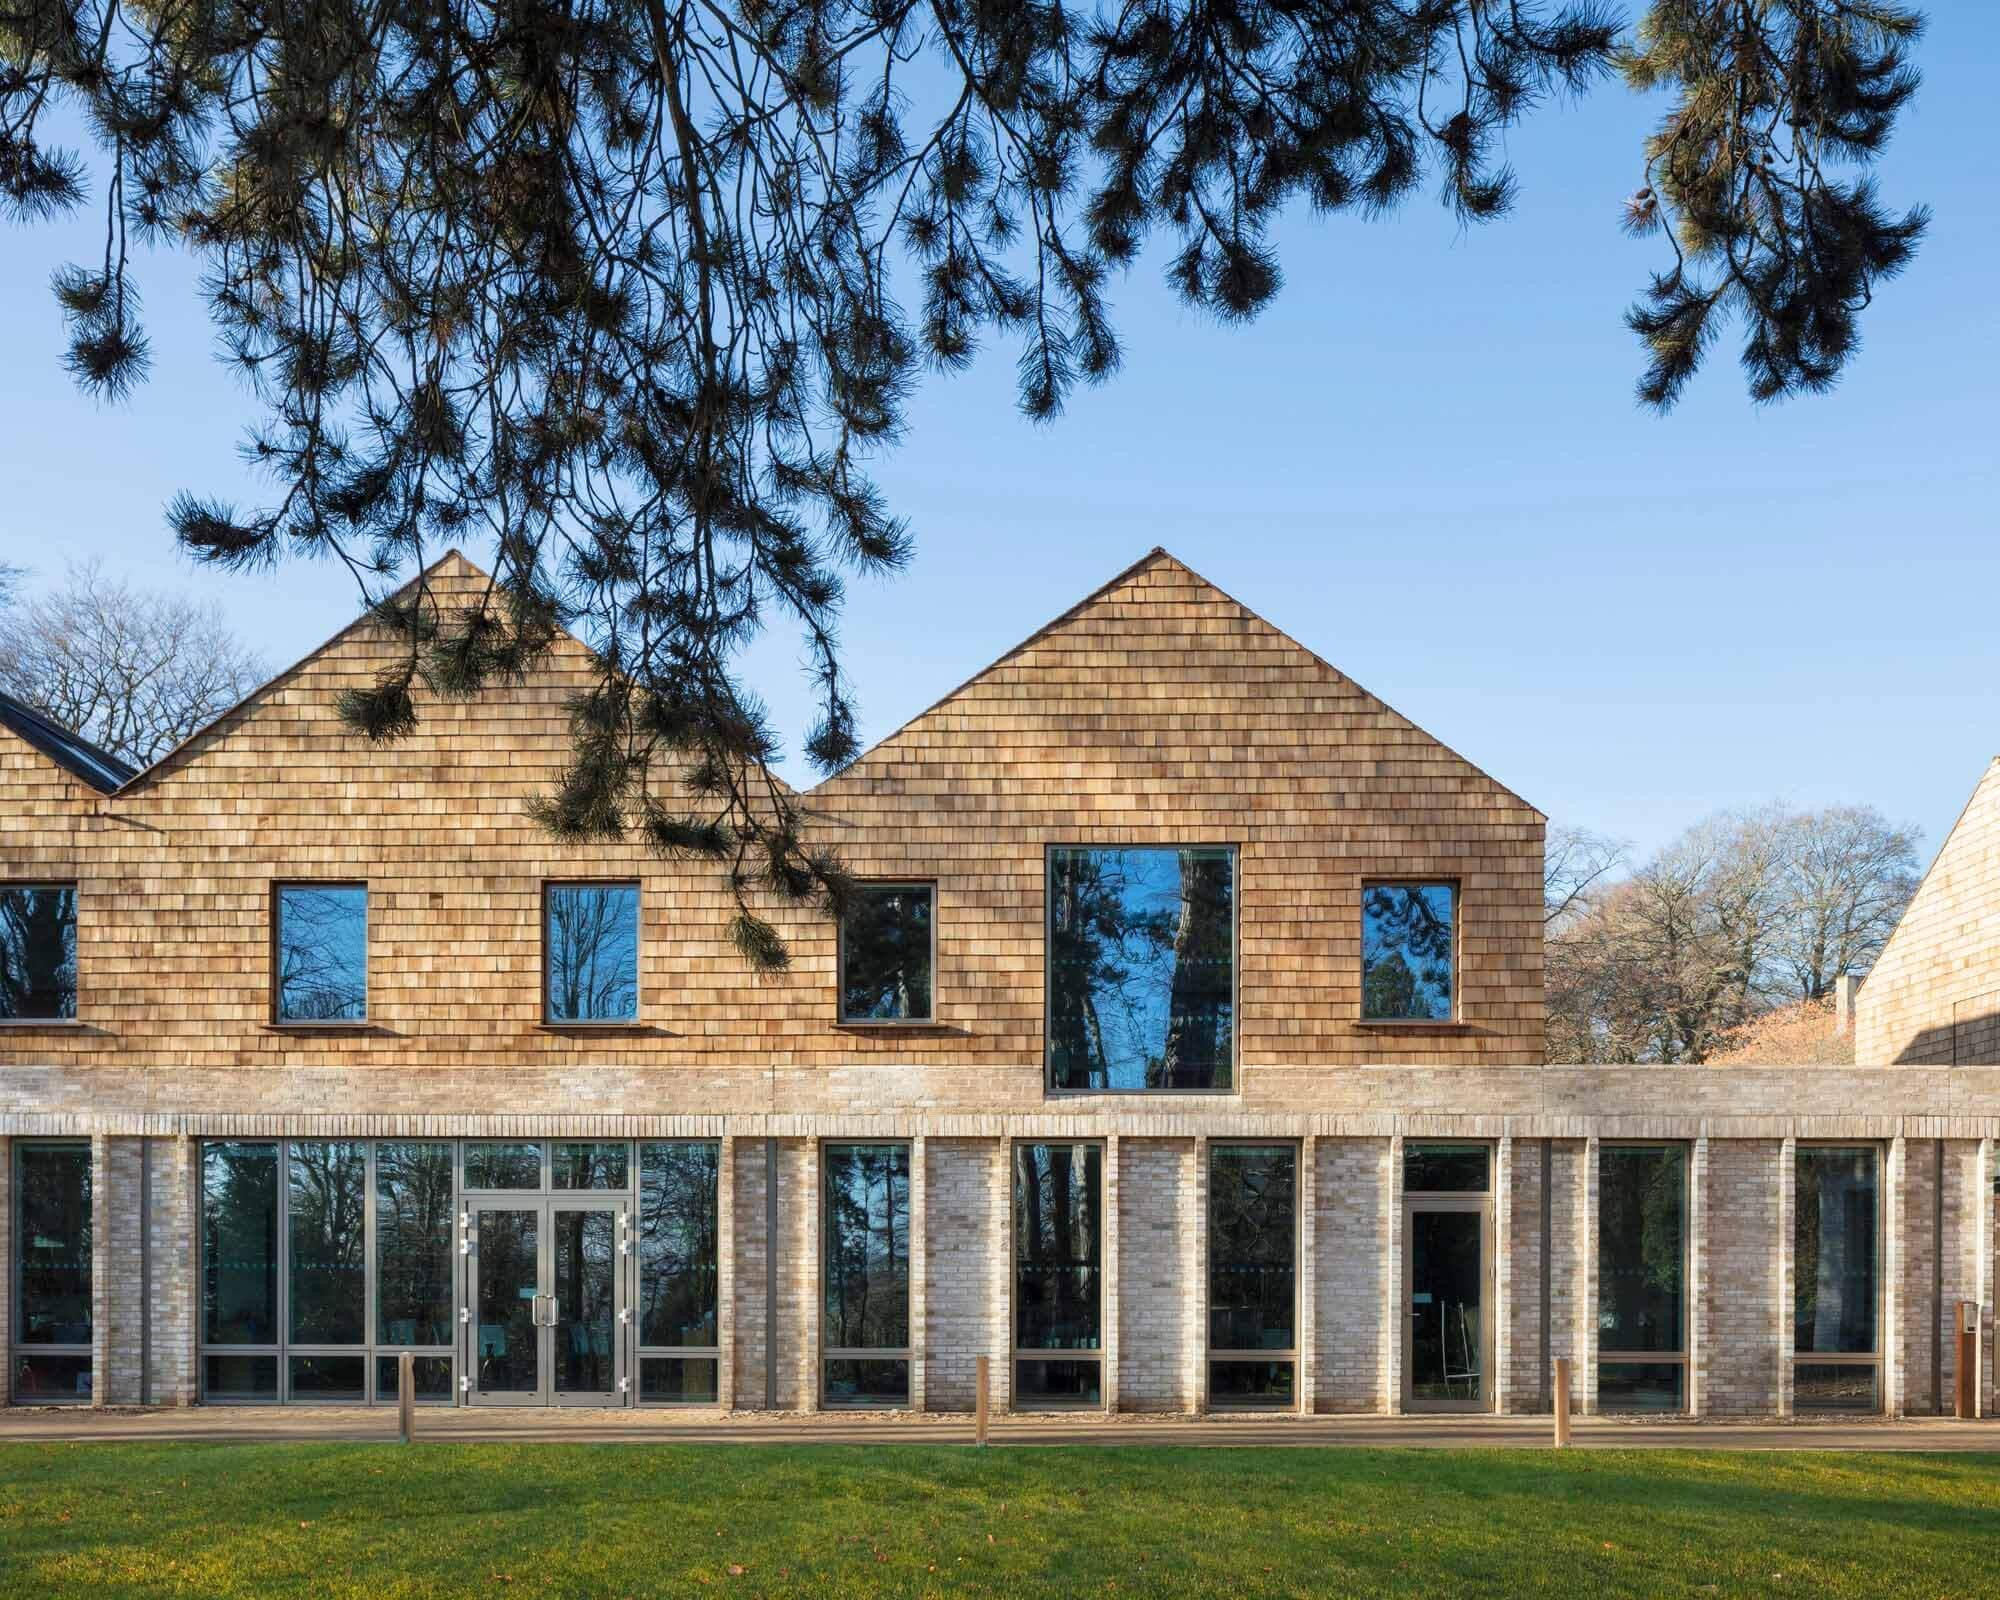 Подготовительная школа Kingswood School, Pre-Prep and Nursery / Stonewood Design